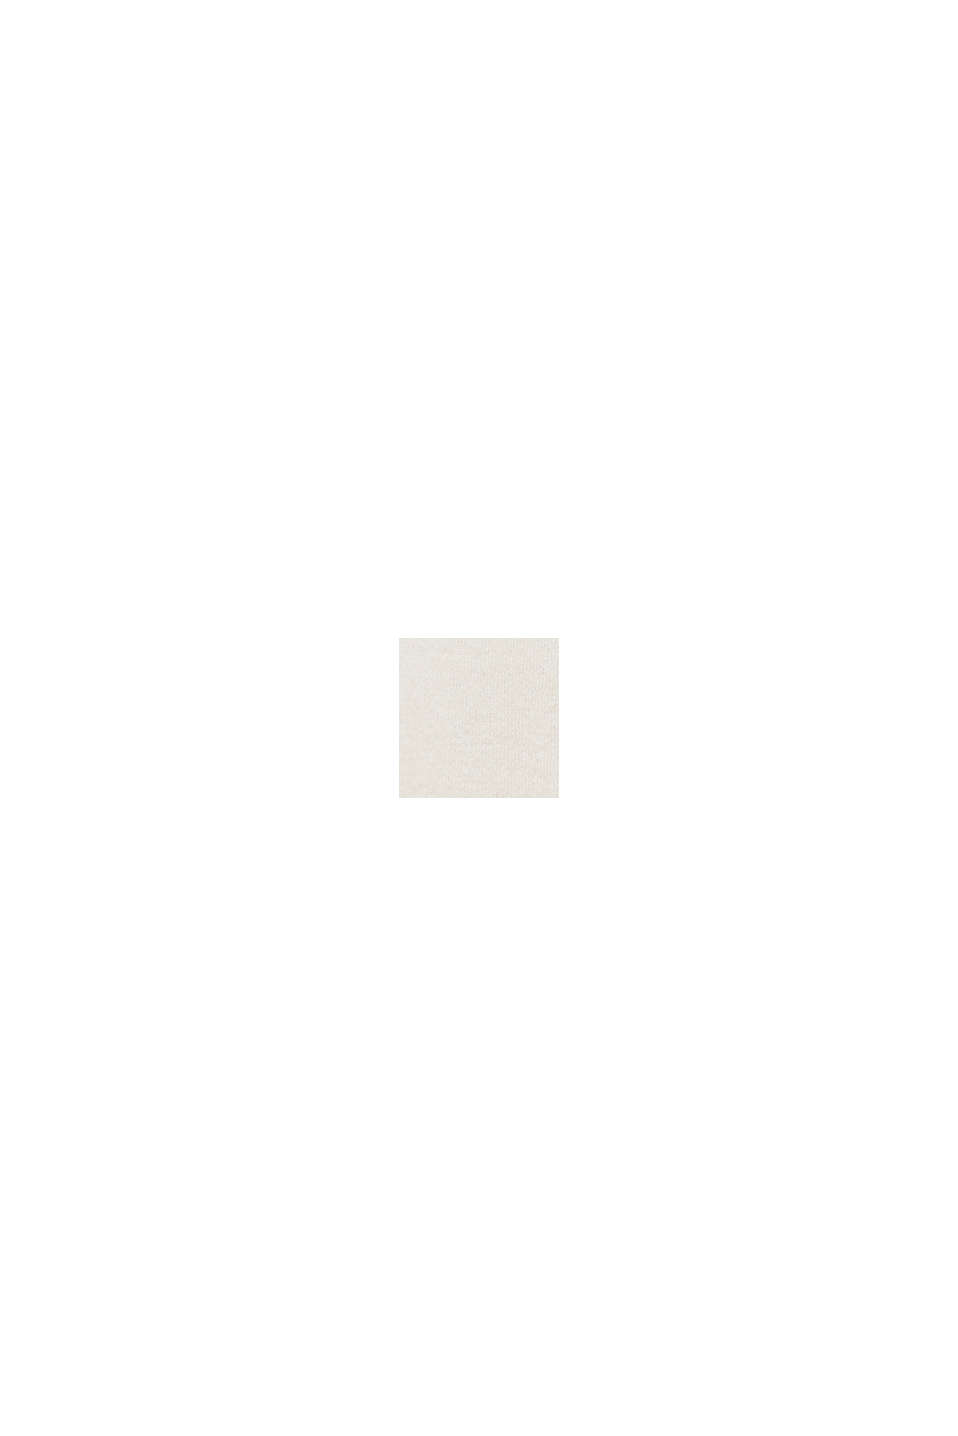 Jumper in an alpaca/wool blend, OFF WHITE, swatch